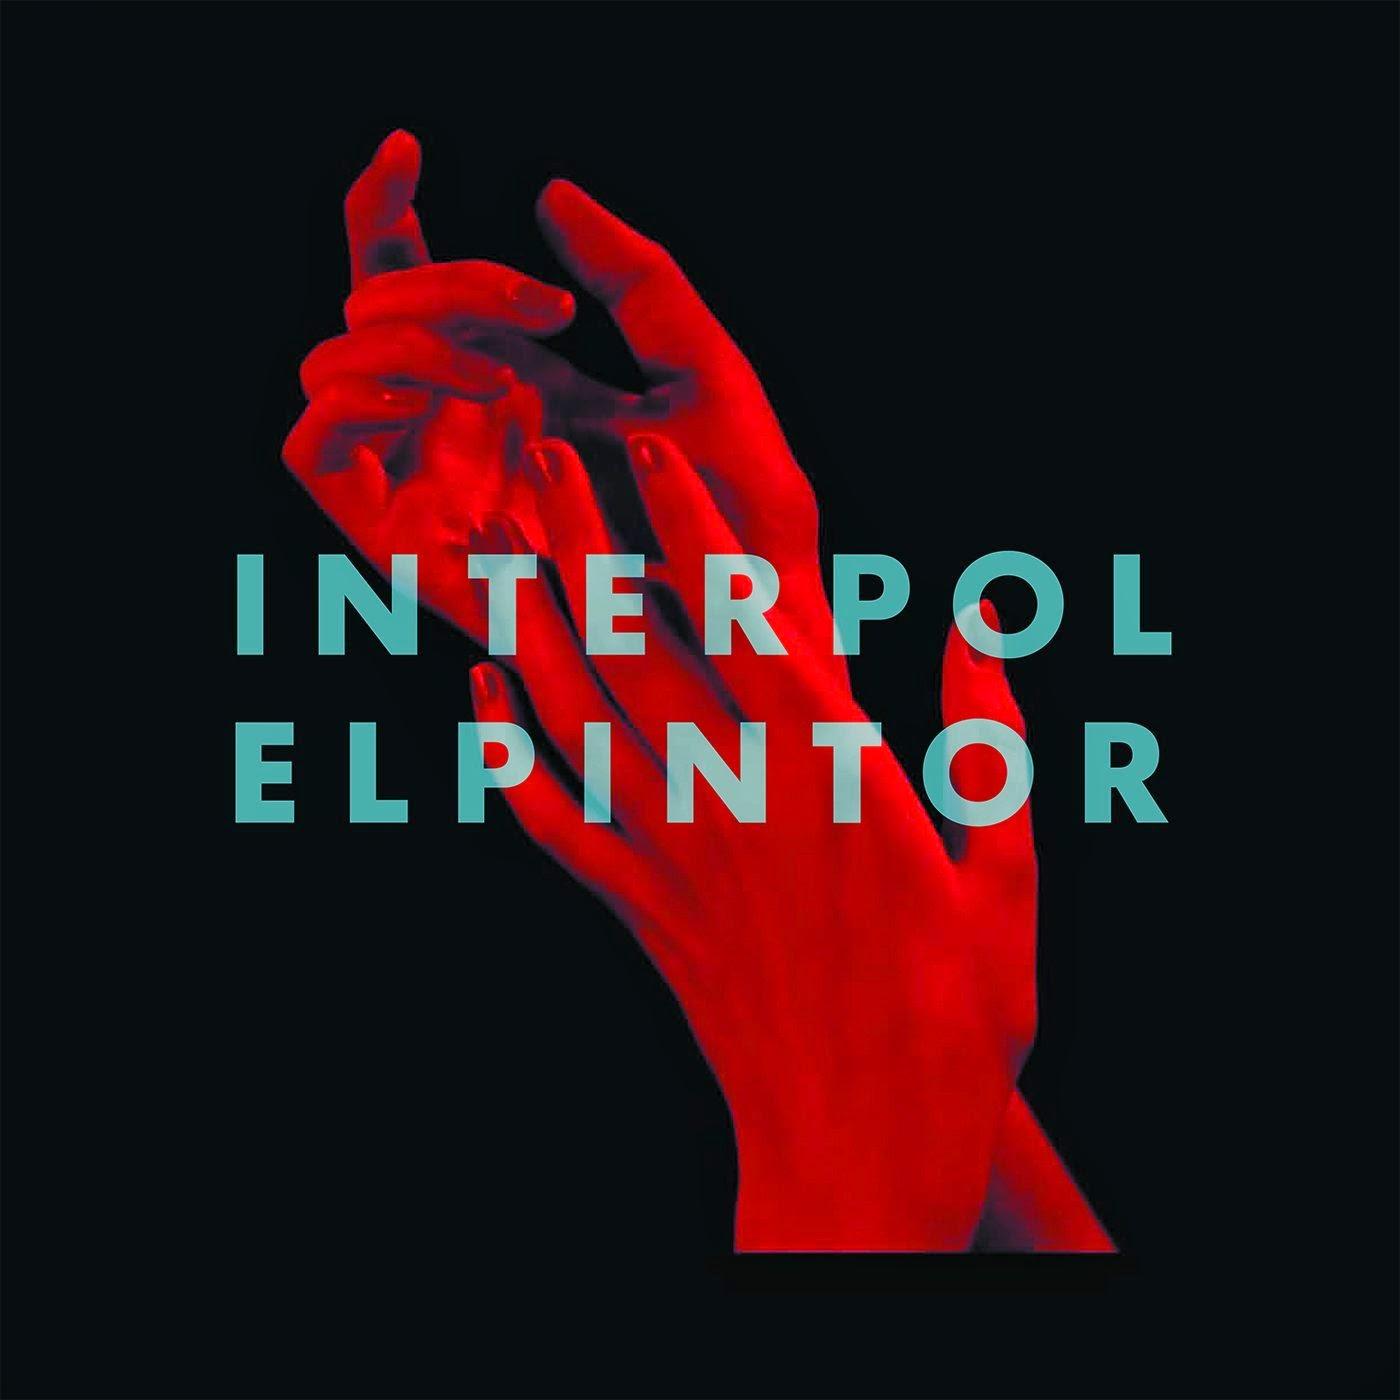 http://www.amazon.de/El-Pintor-Interpol/dp/B00KRYKHH0/ref=sr_1_1?ie=UTF8&qid=1417715341&sr=8-1&keywords=el+pintor+interpol